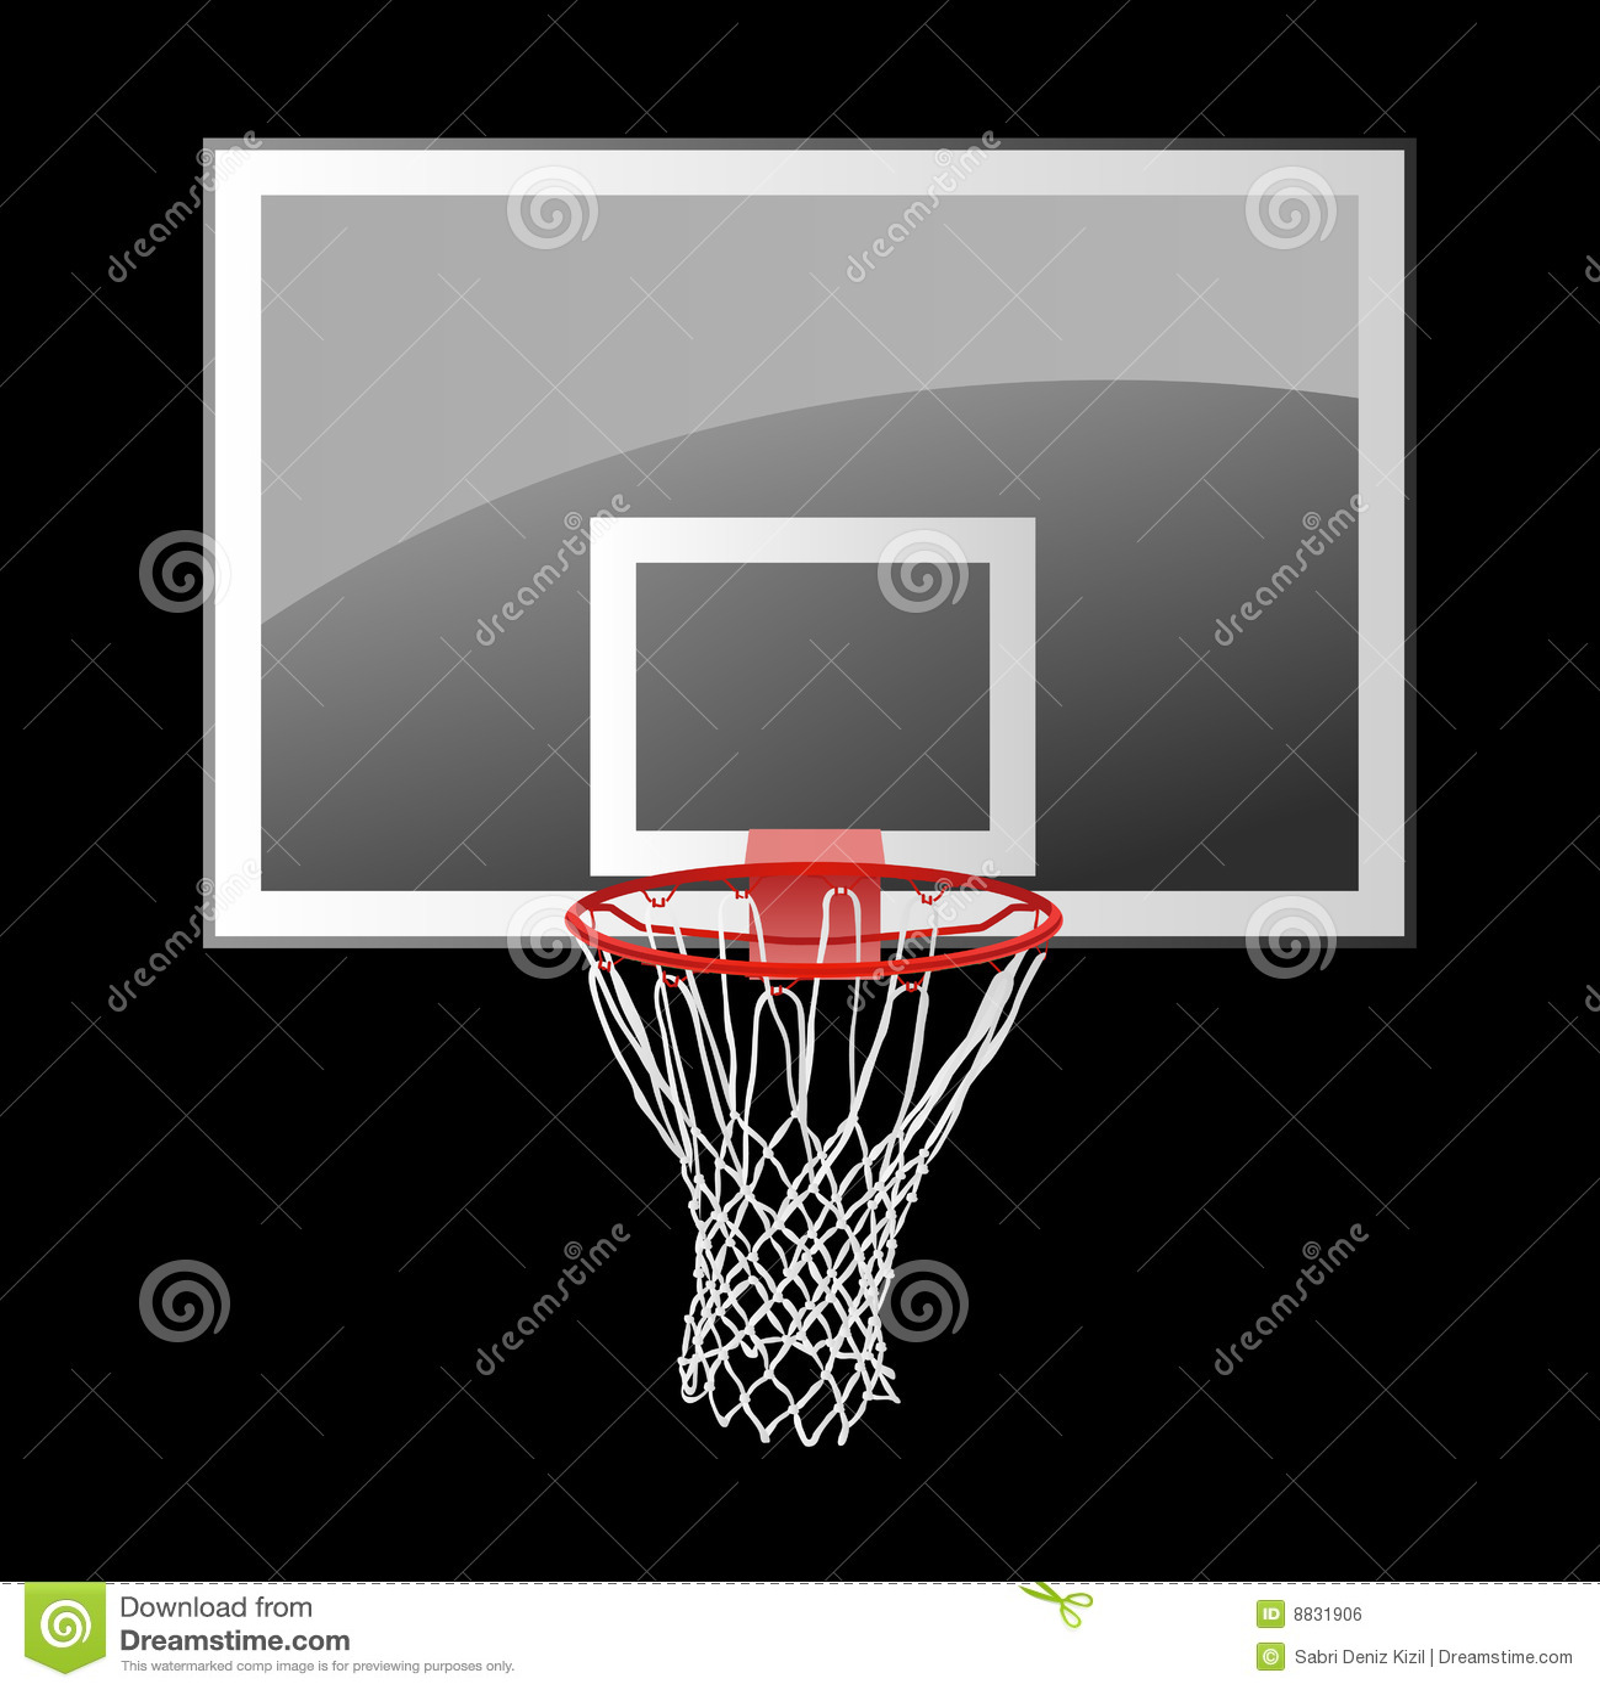 basketball backboard royalty free stock image image 8831906 Basketball Hoop Logo Basketball Net Clip Art